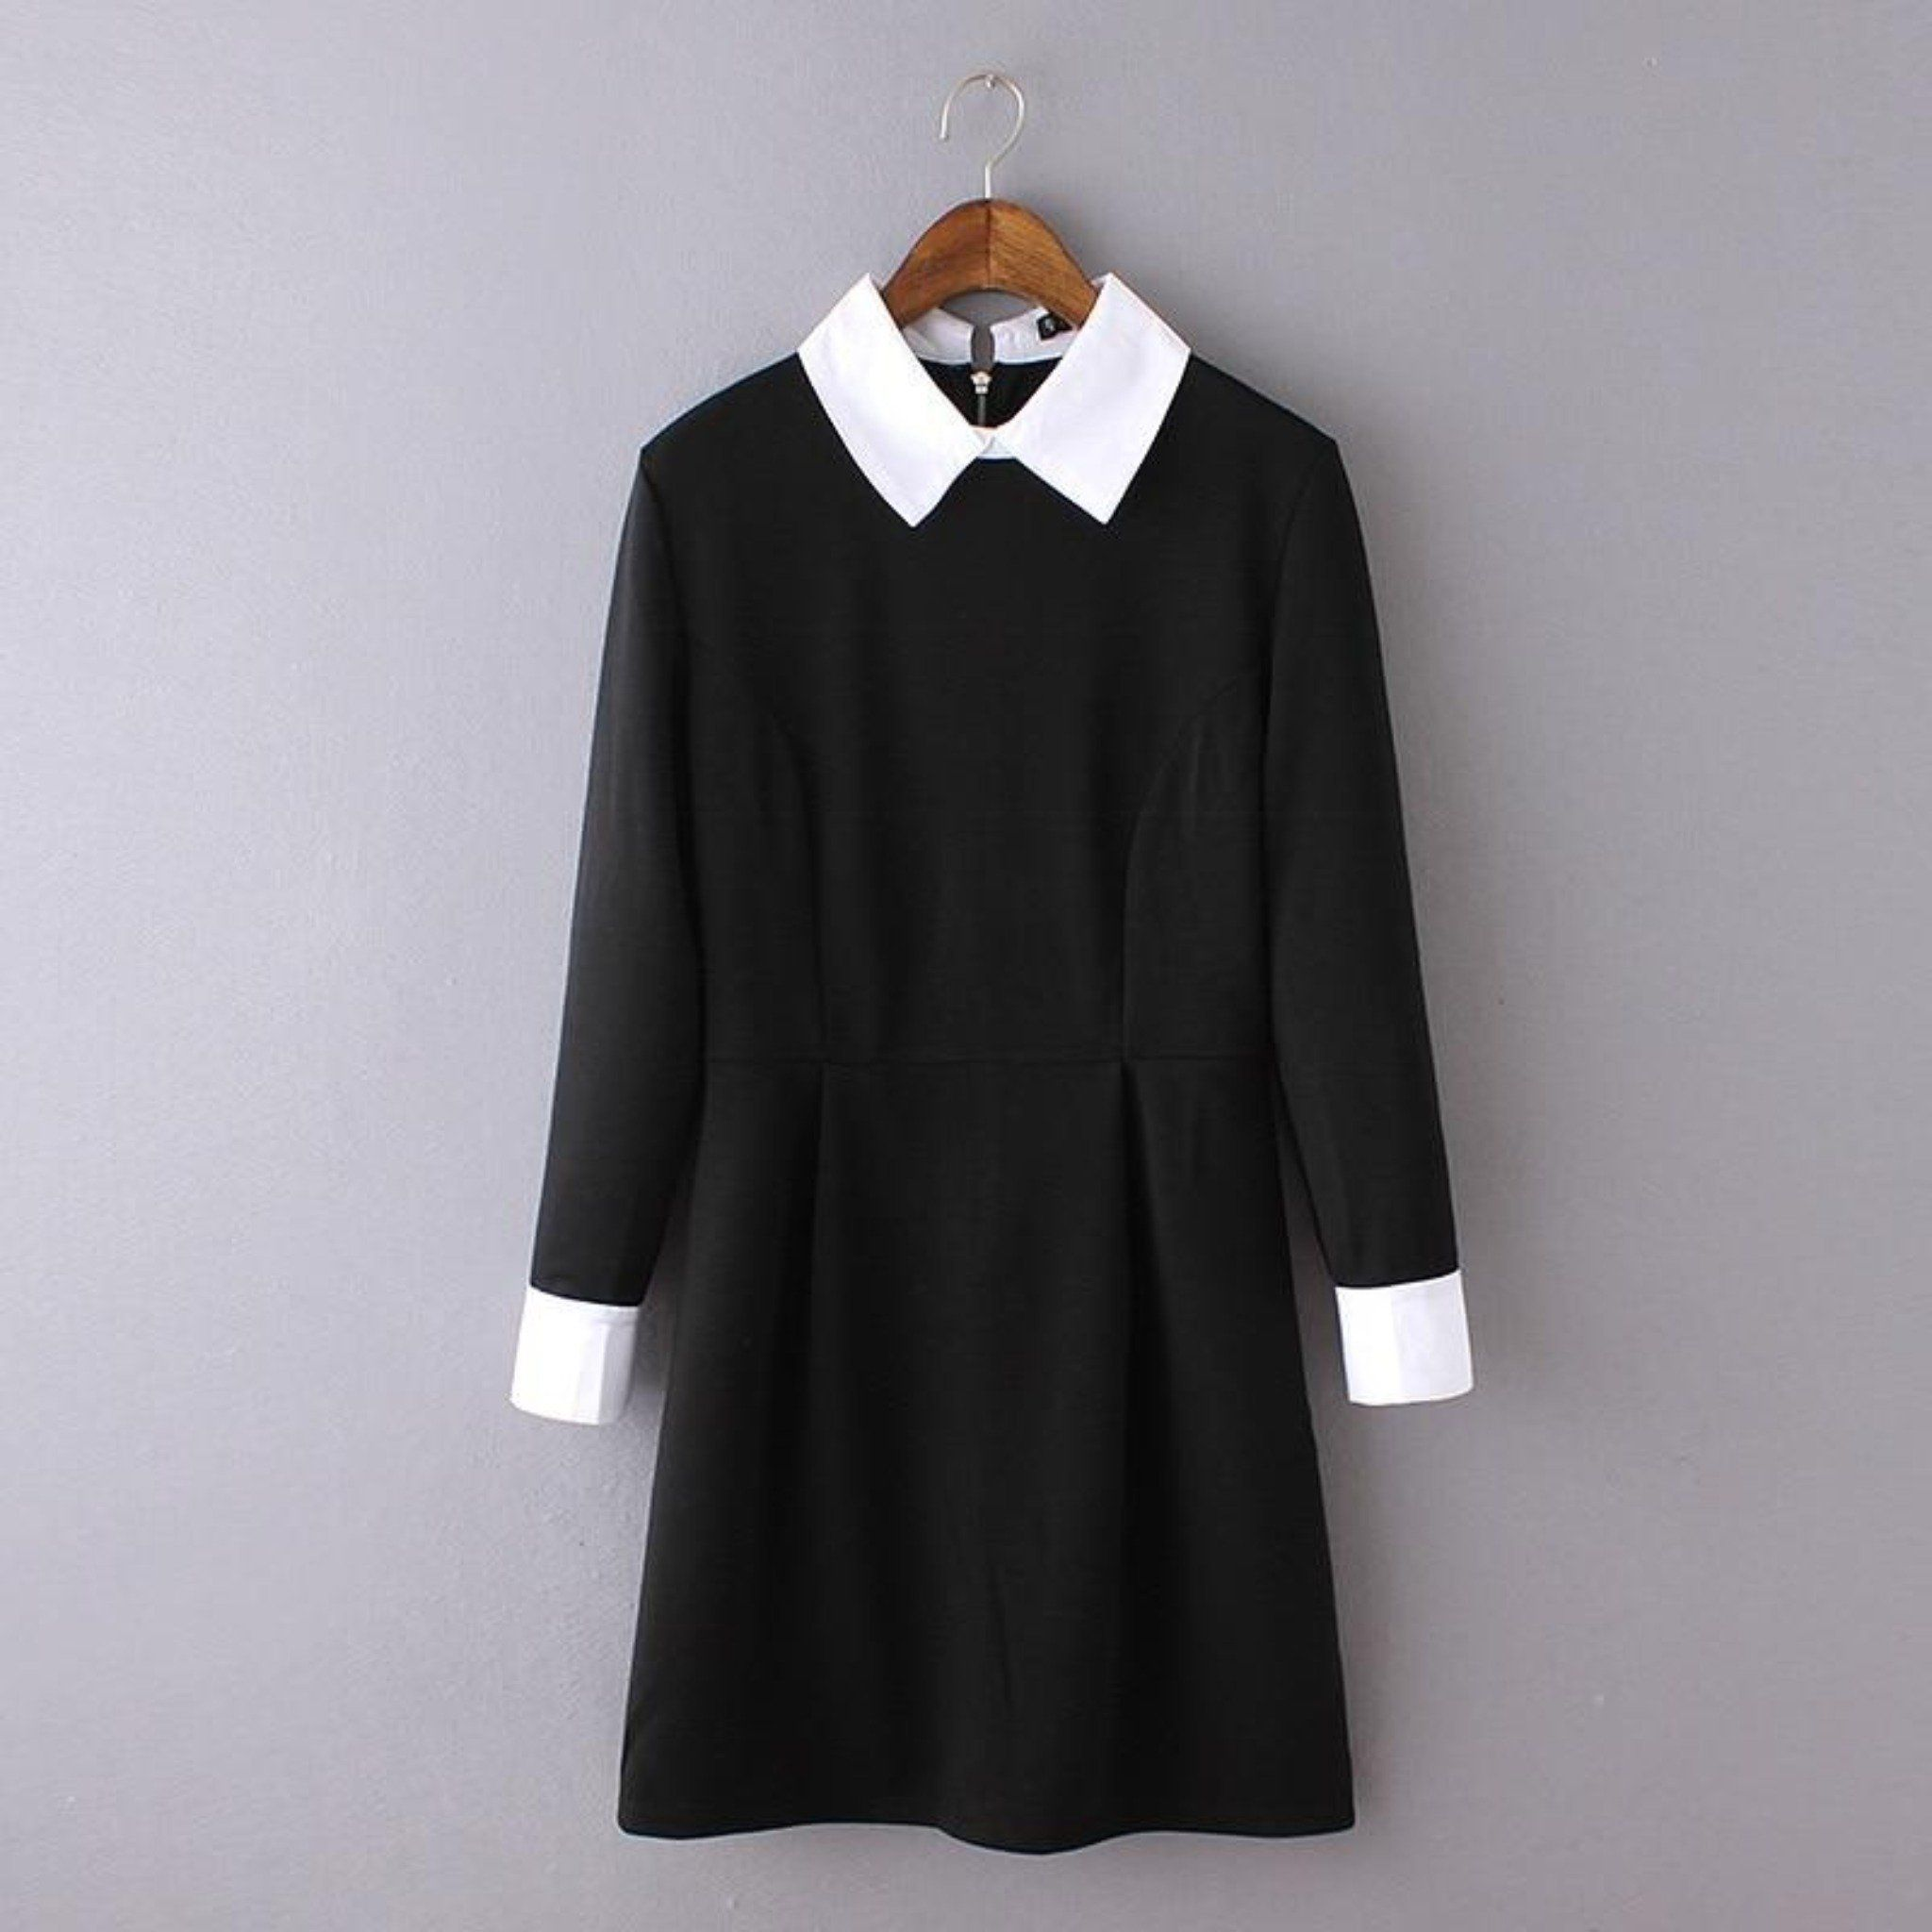 The Basic Wednesday Dress In 2021 Wednesday Dress Black Clothes Women Preppy Dresses [ 2048 x 2048 Pixel ]